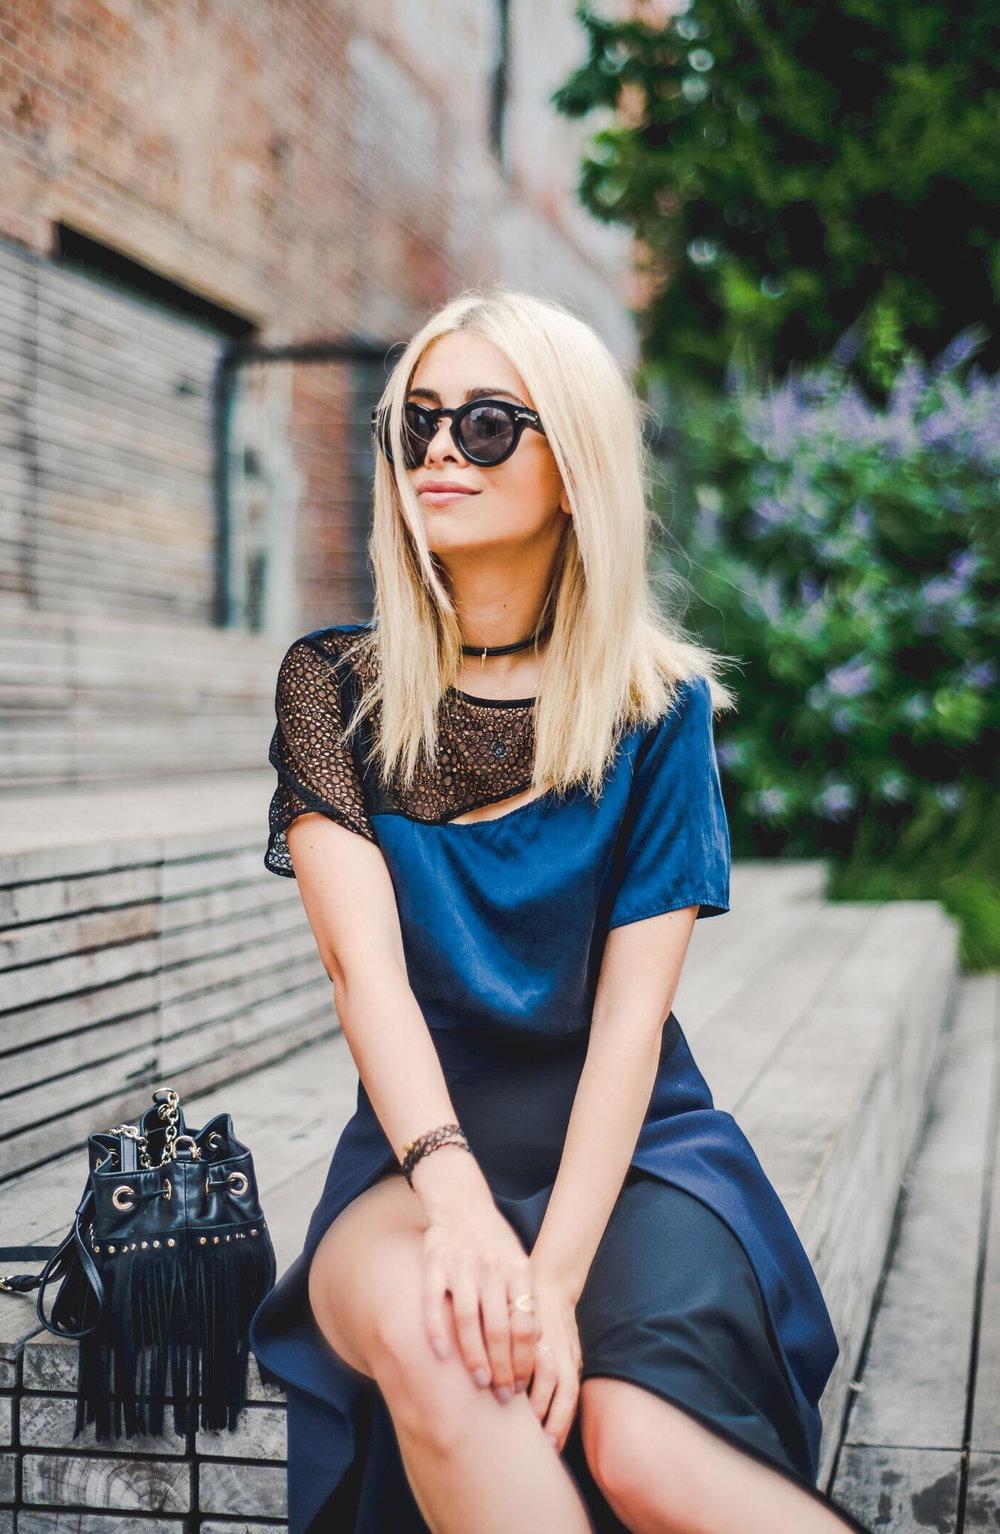 prabal gurung fashion show_prabal gurung spring 17_high slit skirt_slit skirt_savvy javvy_fashion blogger_nyc fashion blogger_nyc blogger_navy skirt_navy silk top_cut out blouse_celine sunglasses_dvf bag